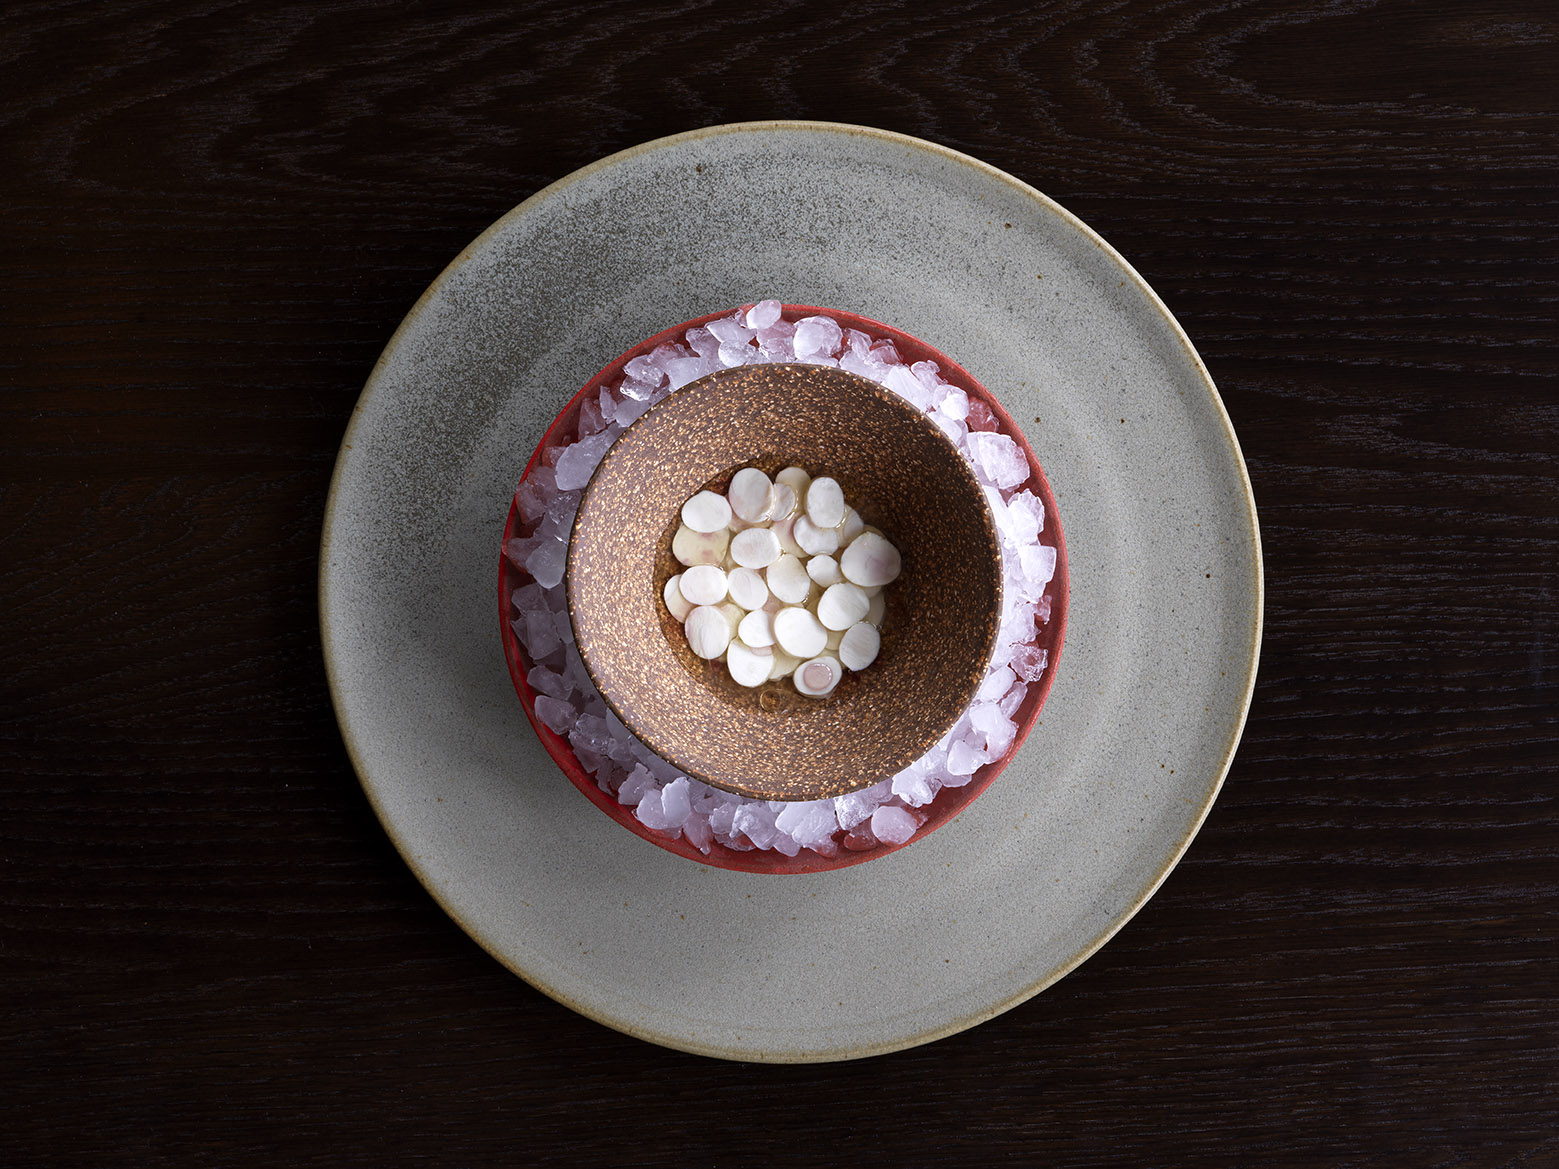 NOMA Unripe macadamia nuts and spann